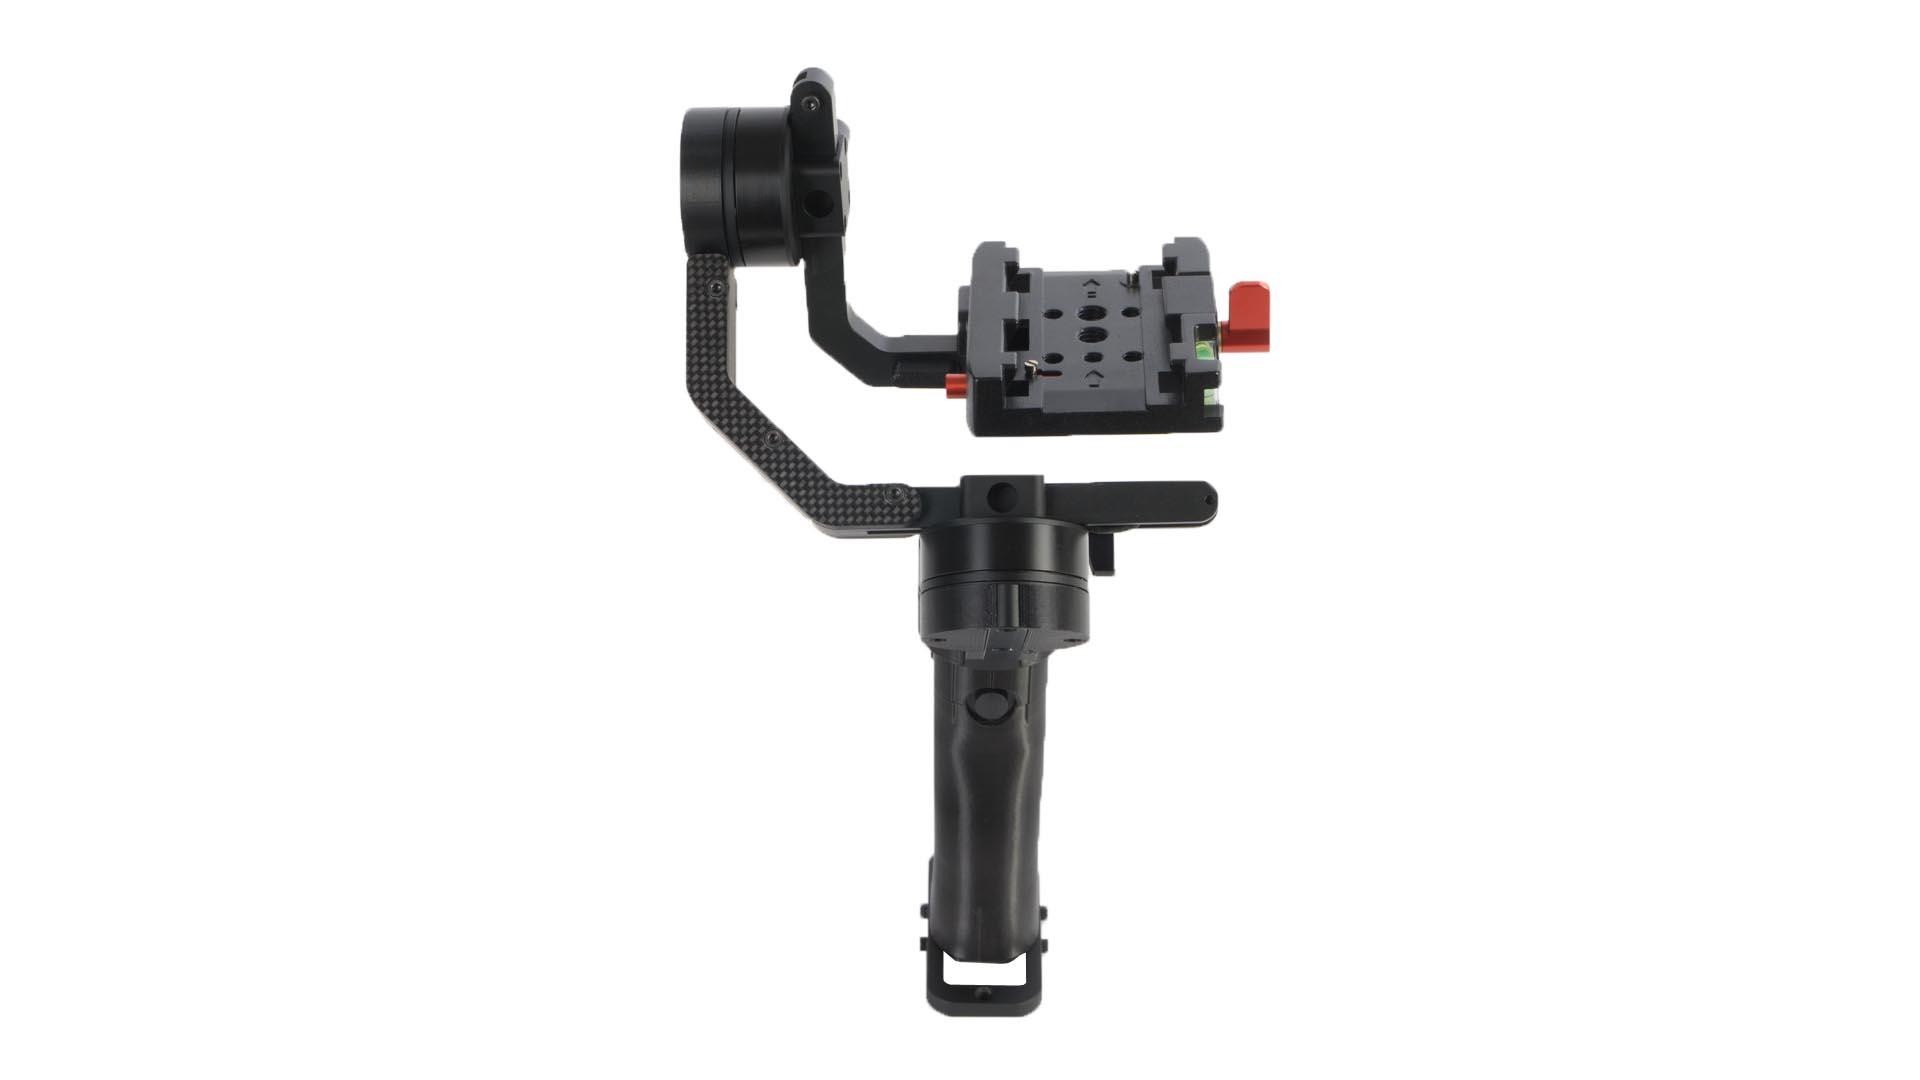 icecam gimbal tiny 3 vision senza camera 2